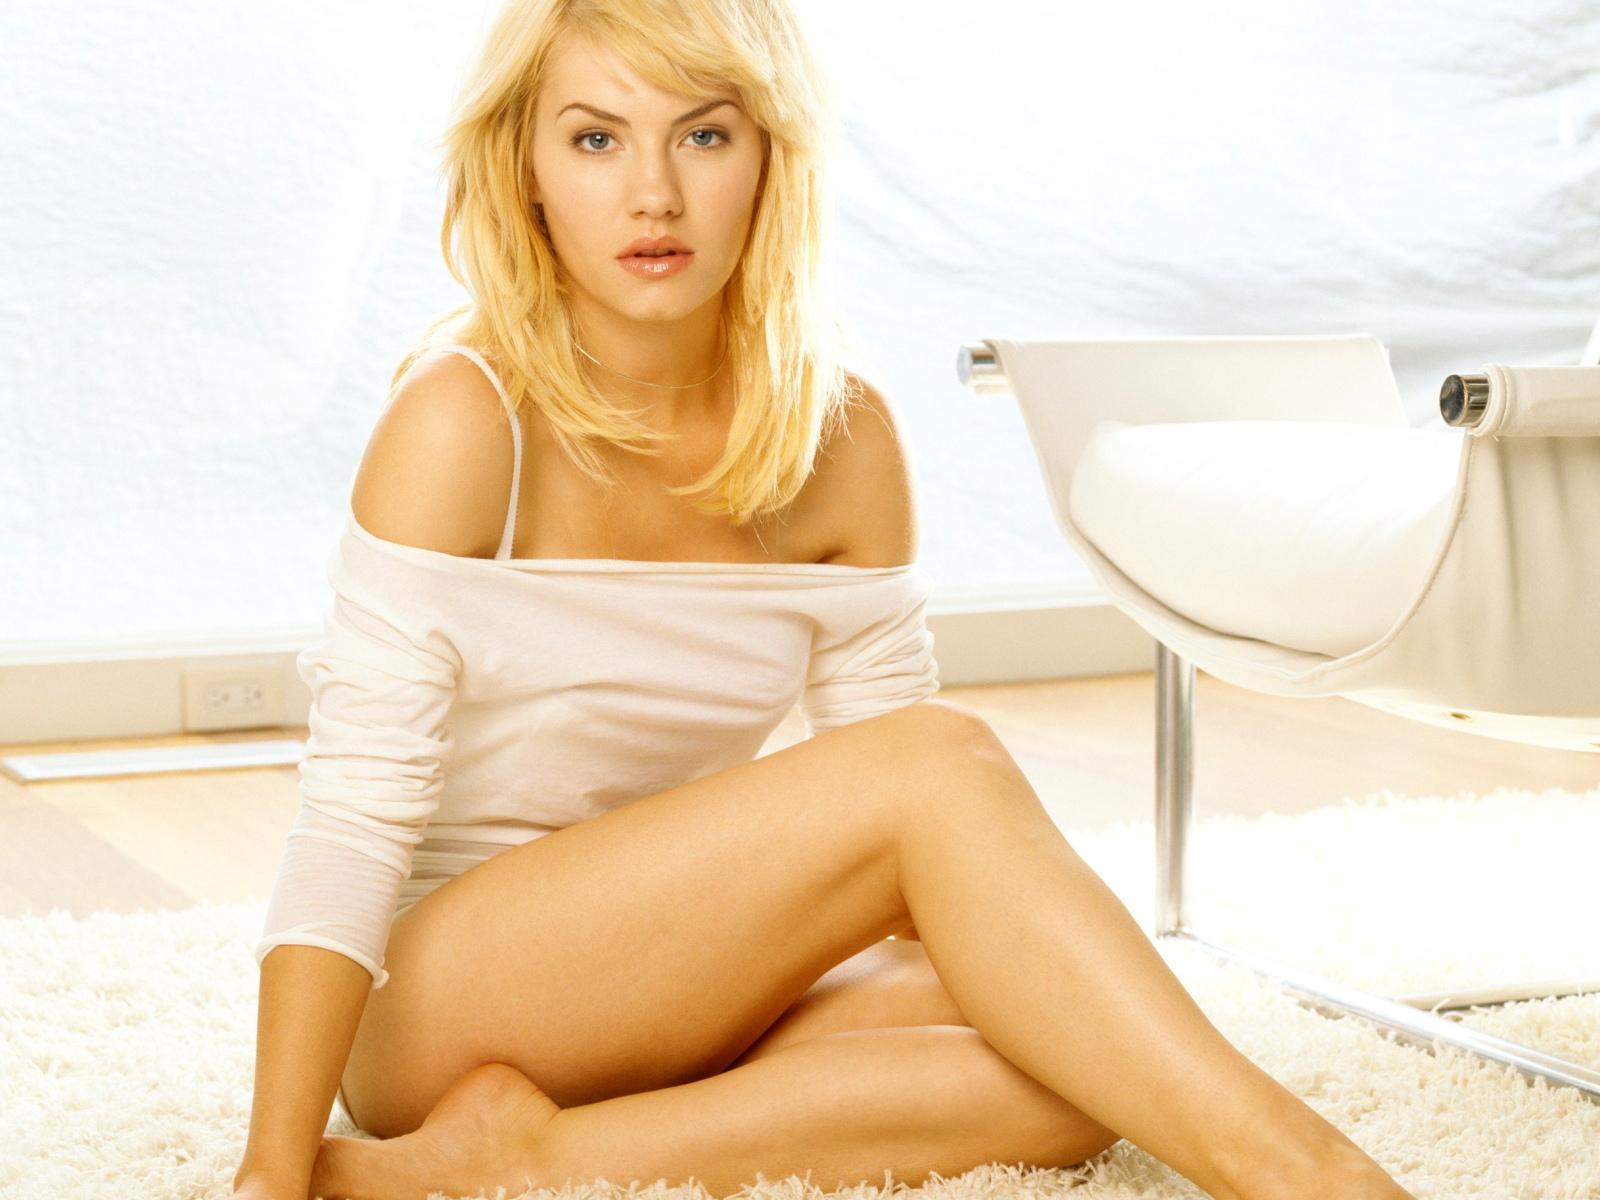 Download Girl Wallpaper Nokia 5233 Soo Cool Pics Elisha Cuthbert Wallpaper In Bikini Jpg